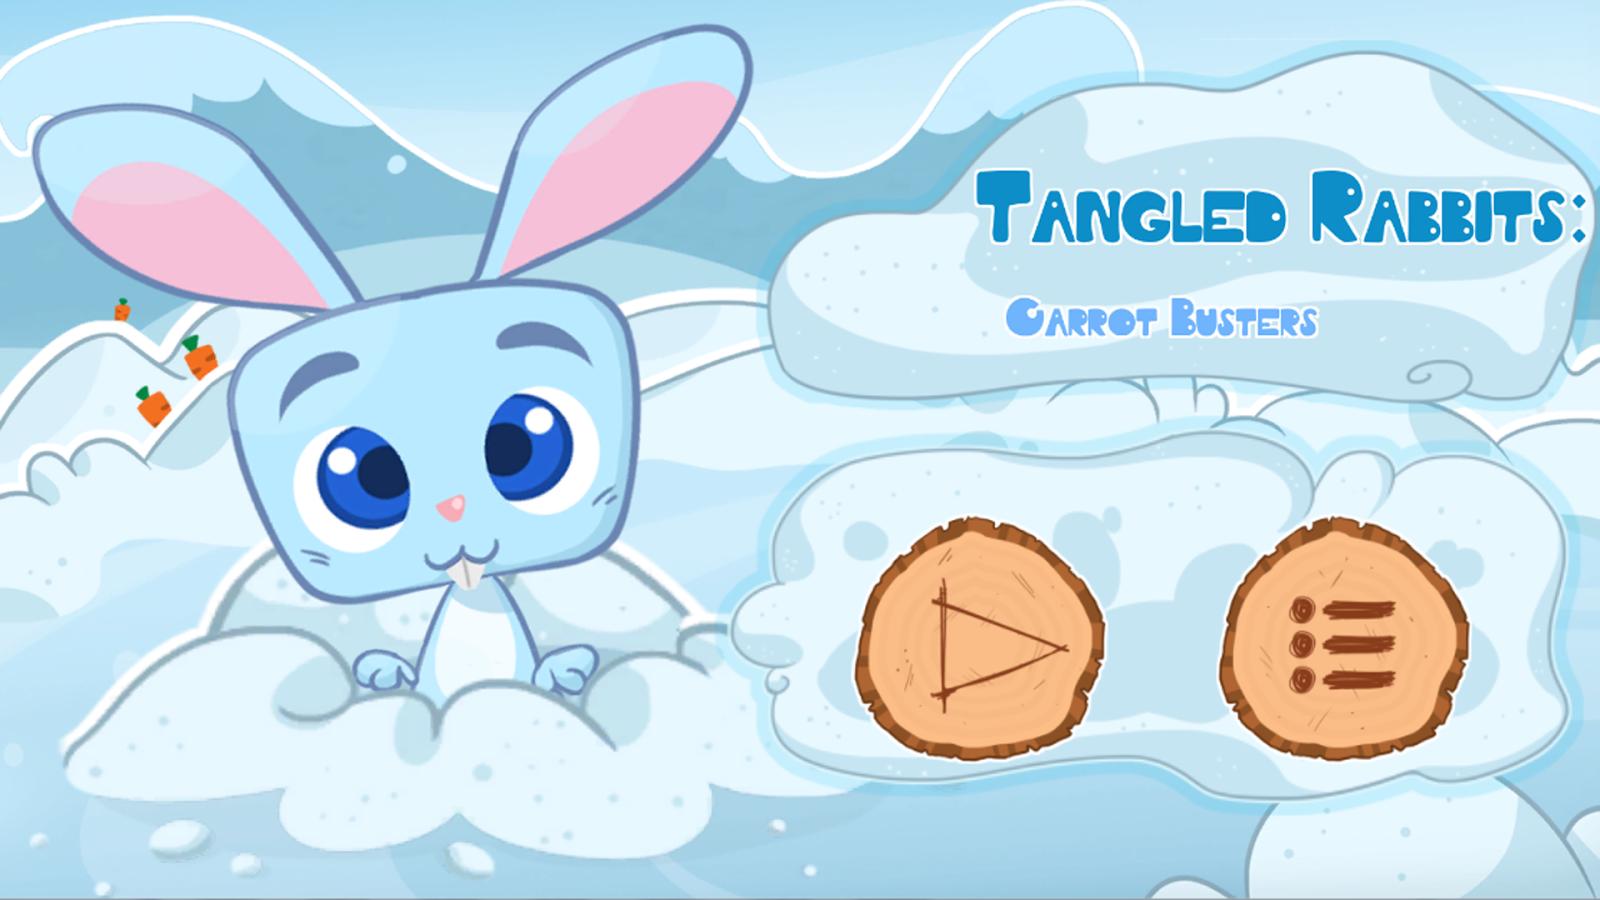 Tangled Rabbits Carrot Busters - screenshot